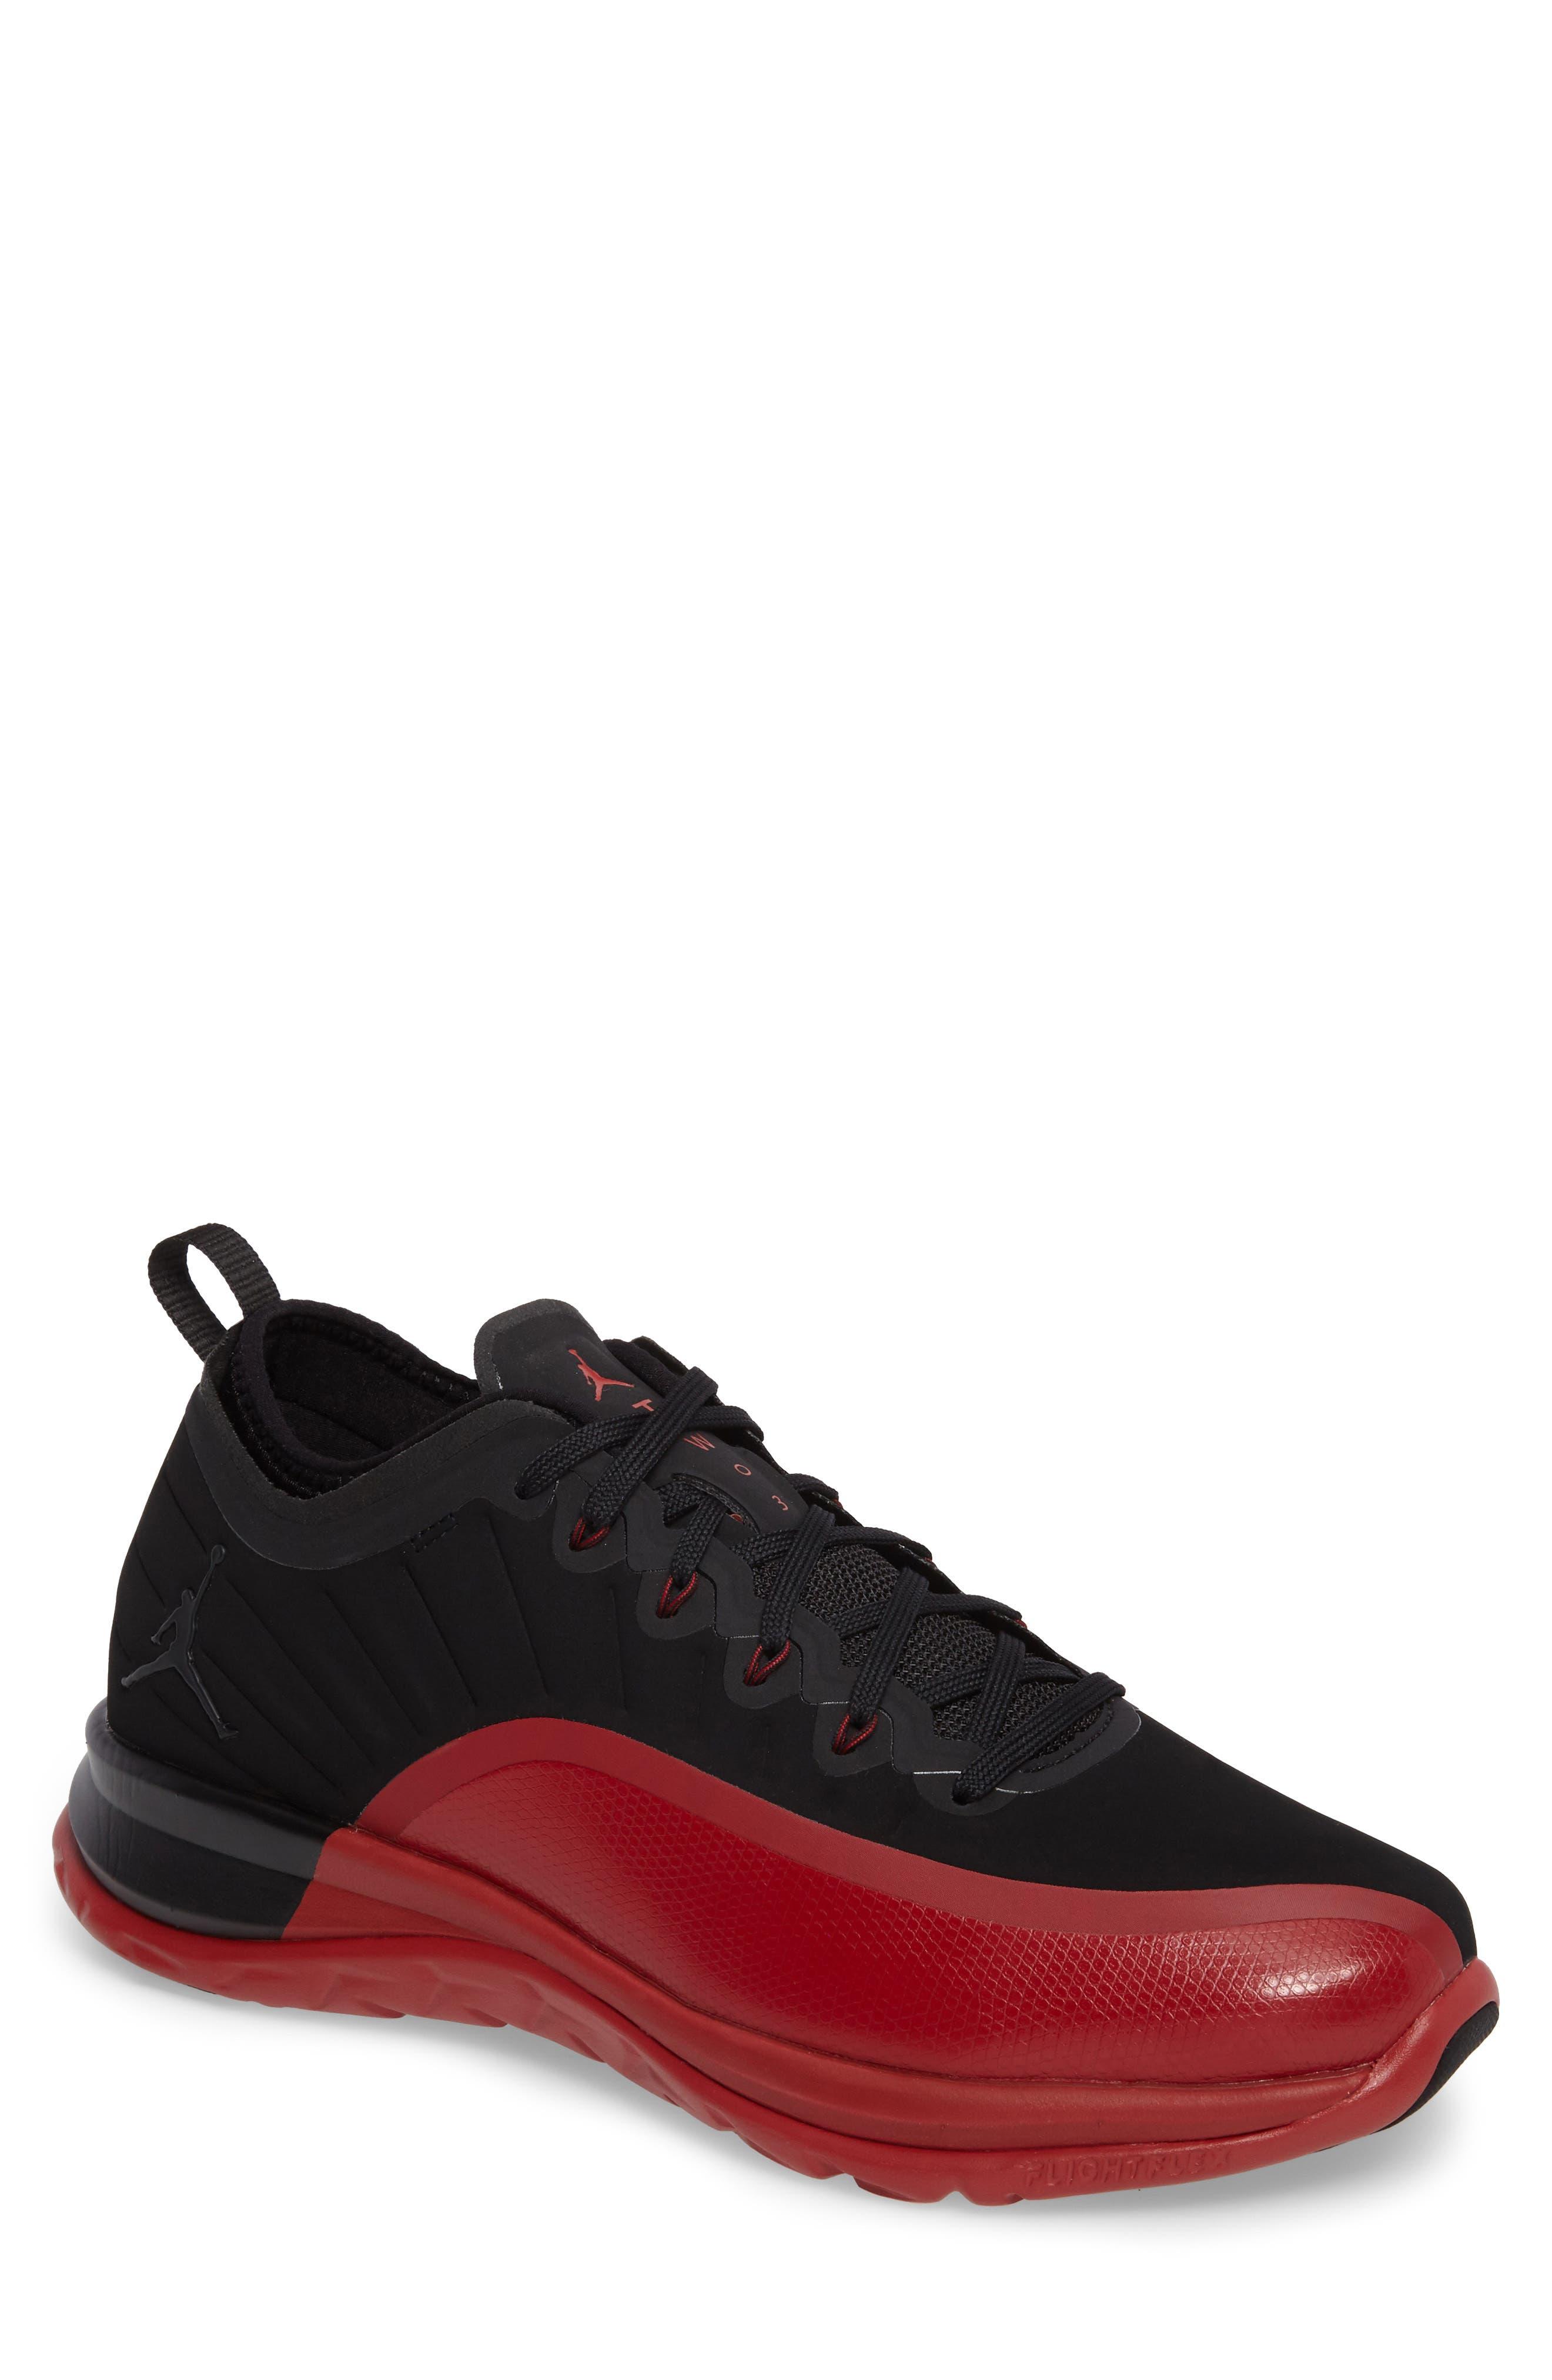 Jordan Trainer Prime Sneaker,                         Main,                         color, Black/ Black/ Gym Red